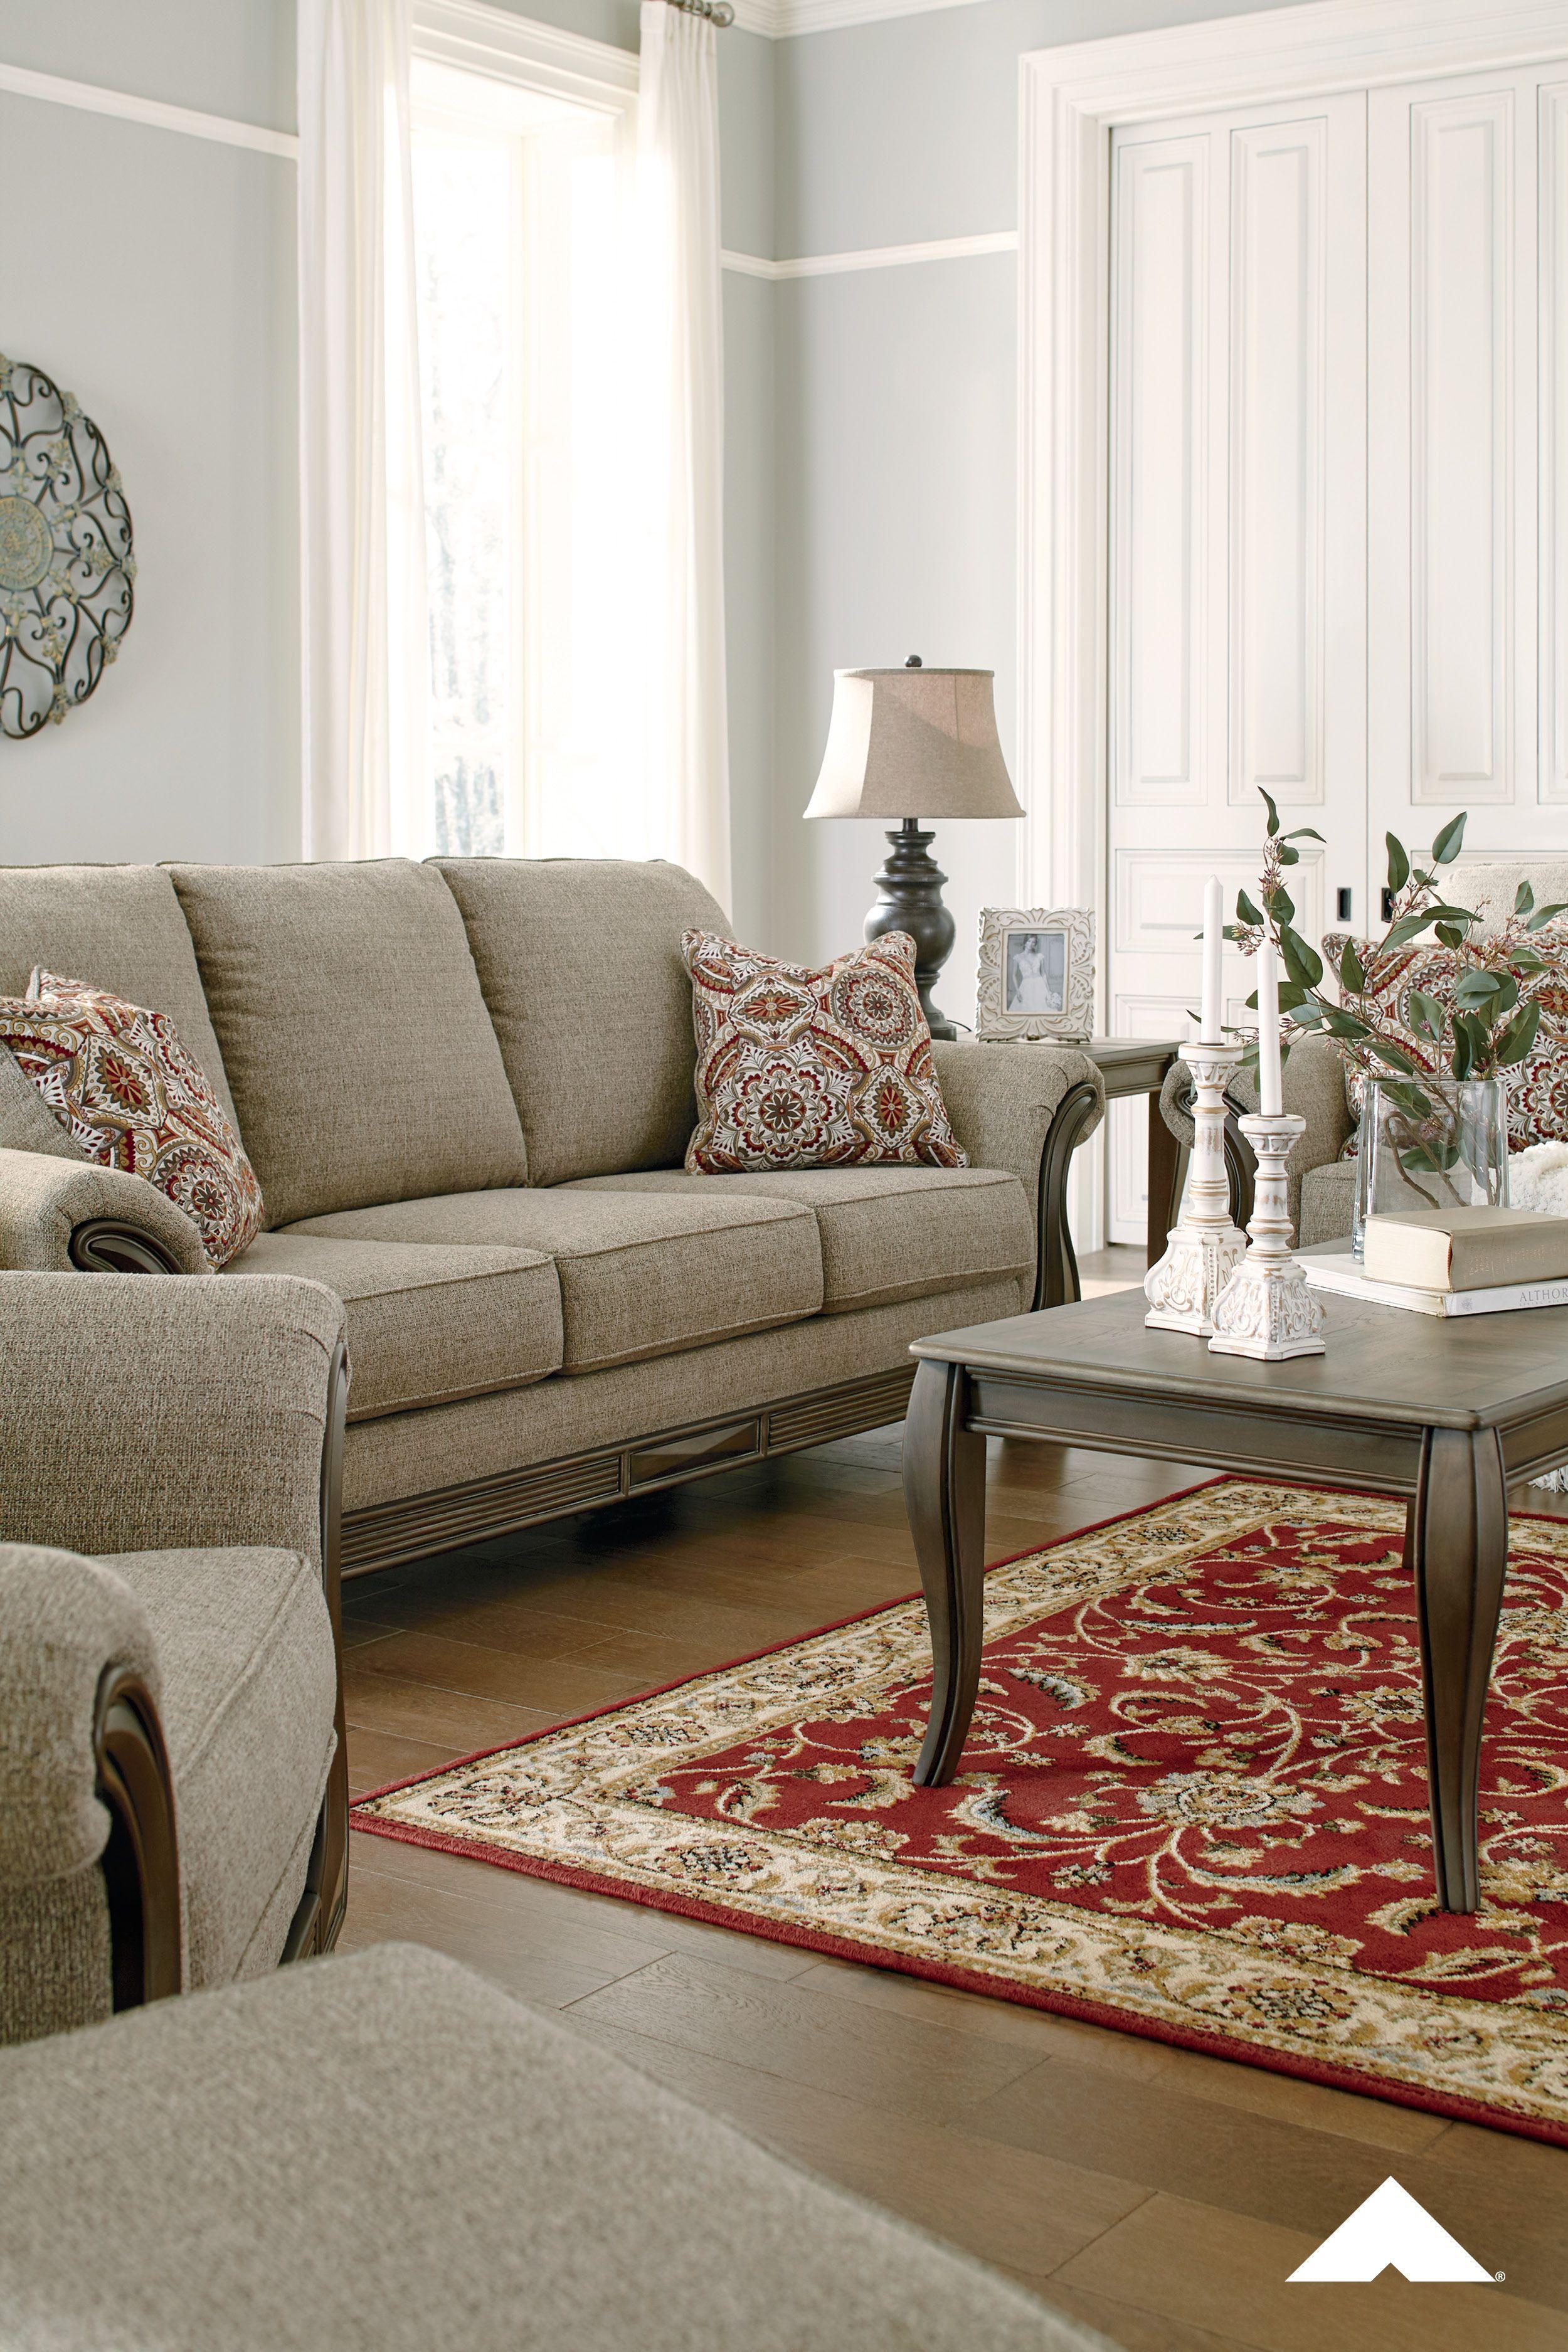 Enjoyable Claremorris Fog Sofa Bring Back A Sense Of Tradition Flair Cjindustries Chair Design For Home Cjindustriesco